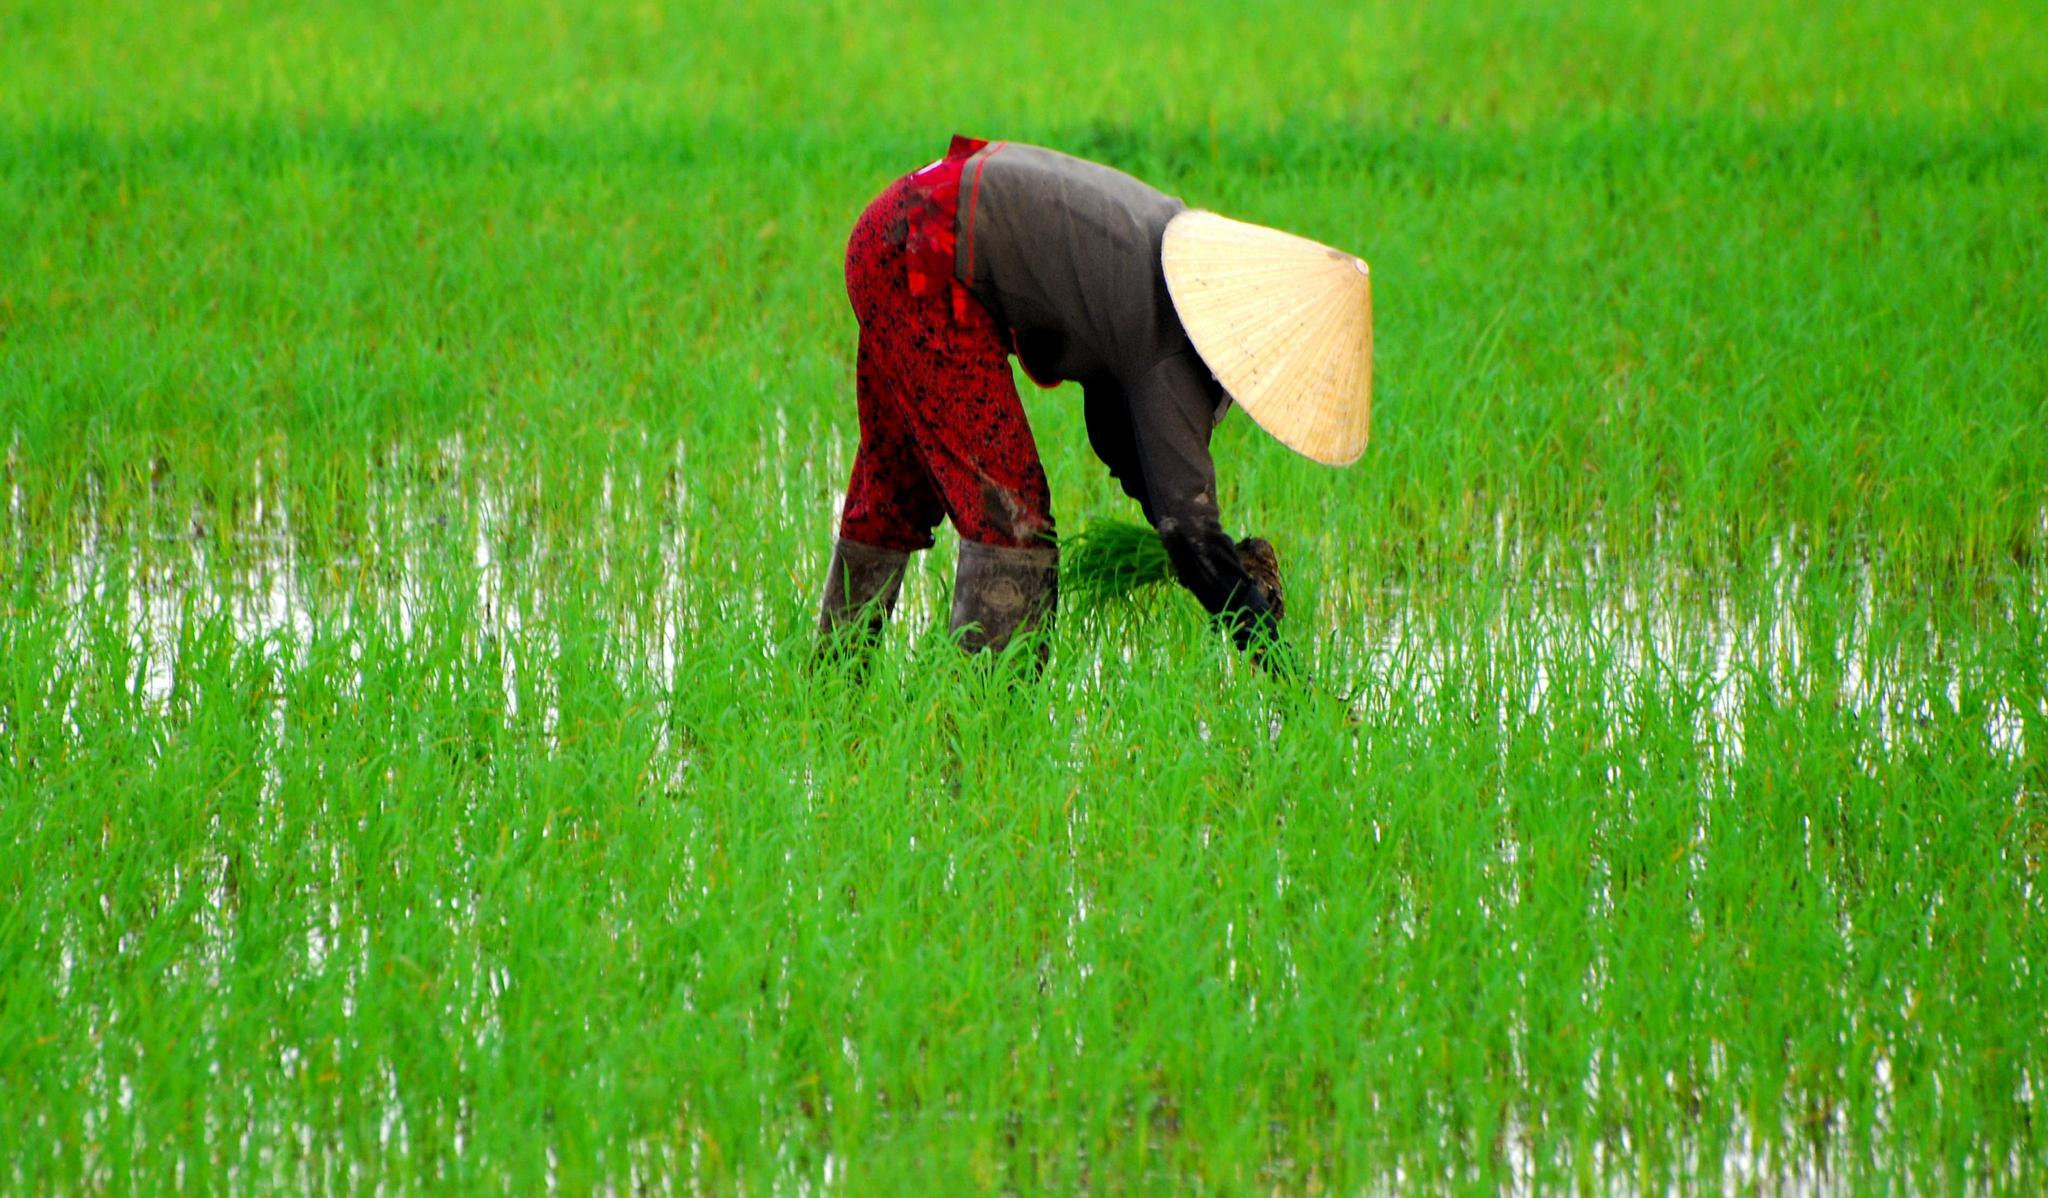 rice farmer by ciocca.alessandro